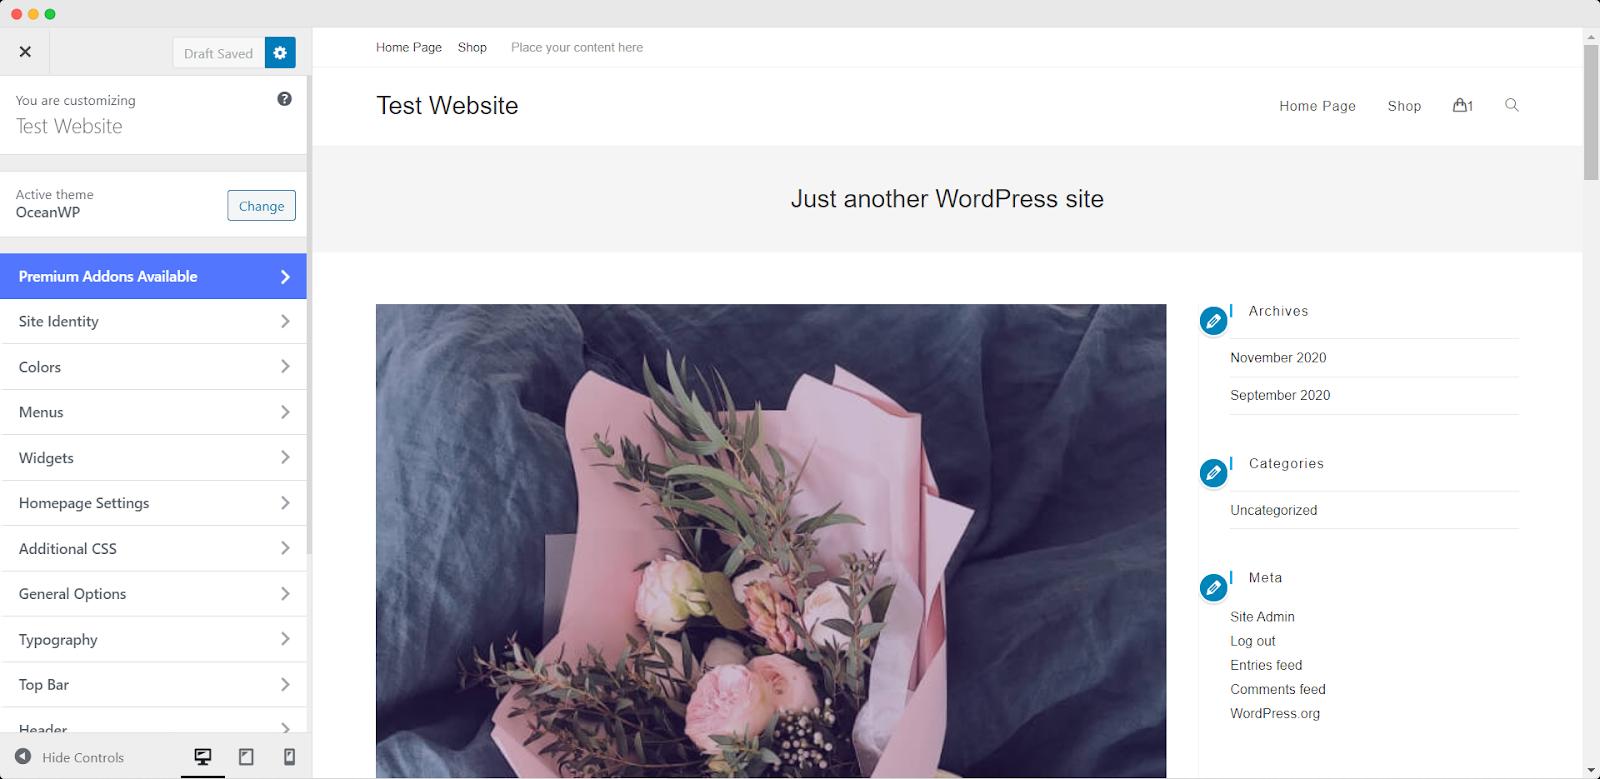 Top 5 Best FREE WordPress Themes for Elementor + Bonus Templates [2021] 5